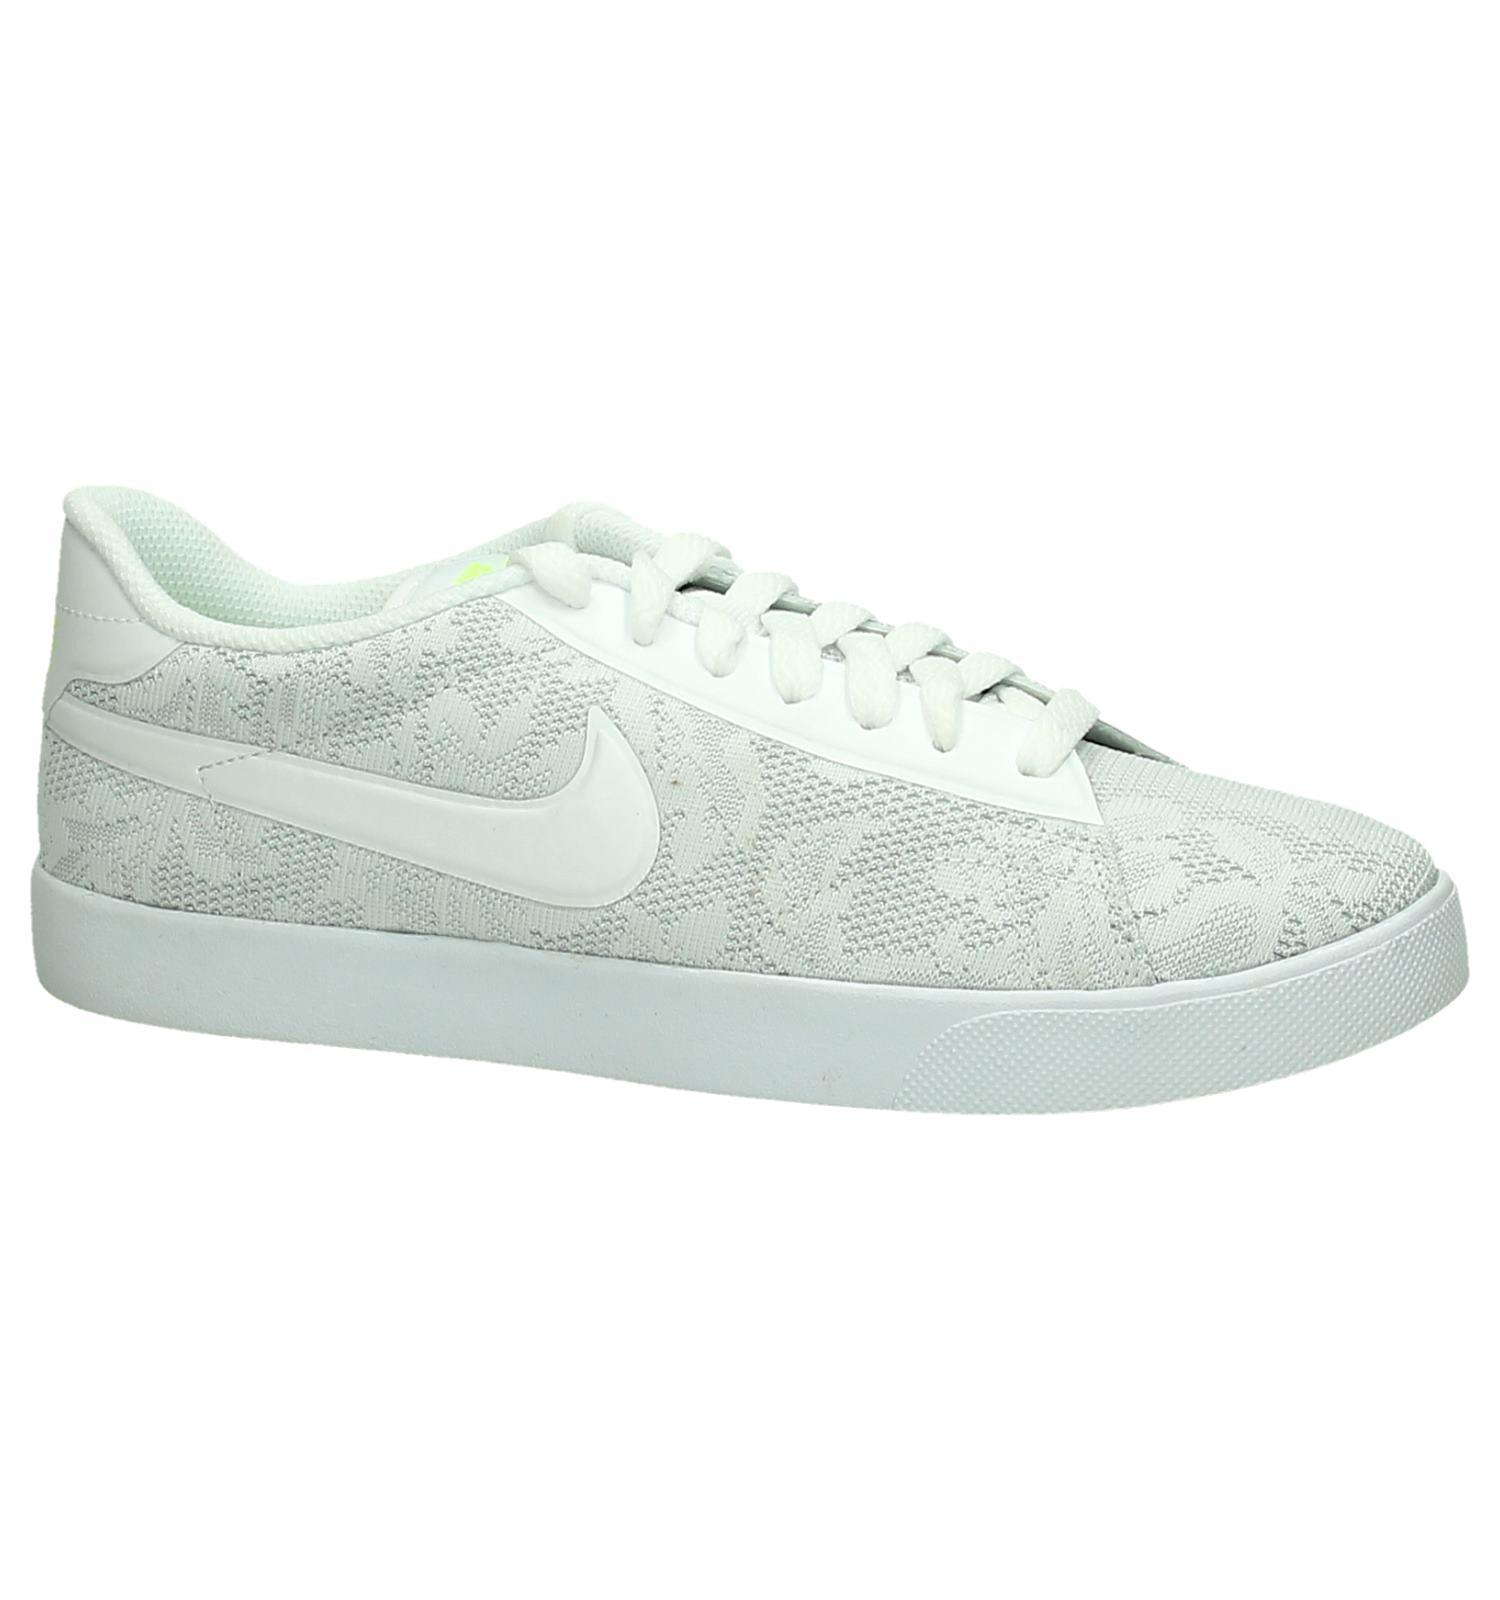 0bea58917d6 Witte Nike Sneakers Racquette met Kant | TORFS.BE | Gratis verzend en retour